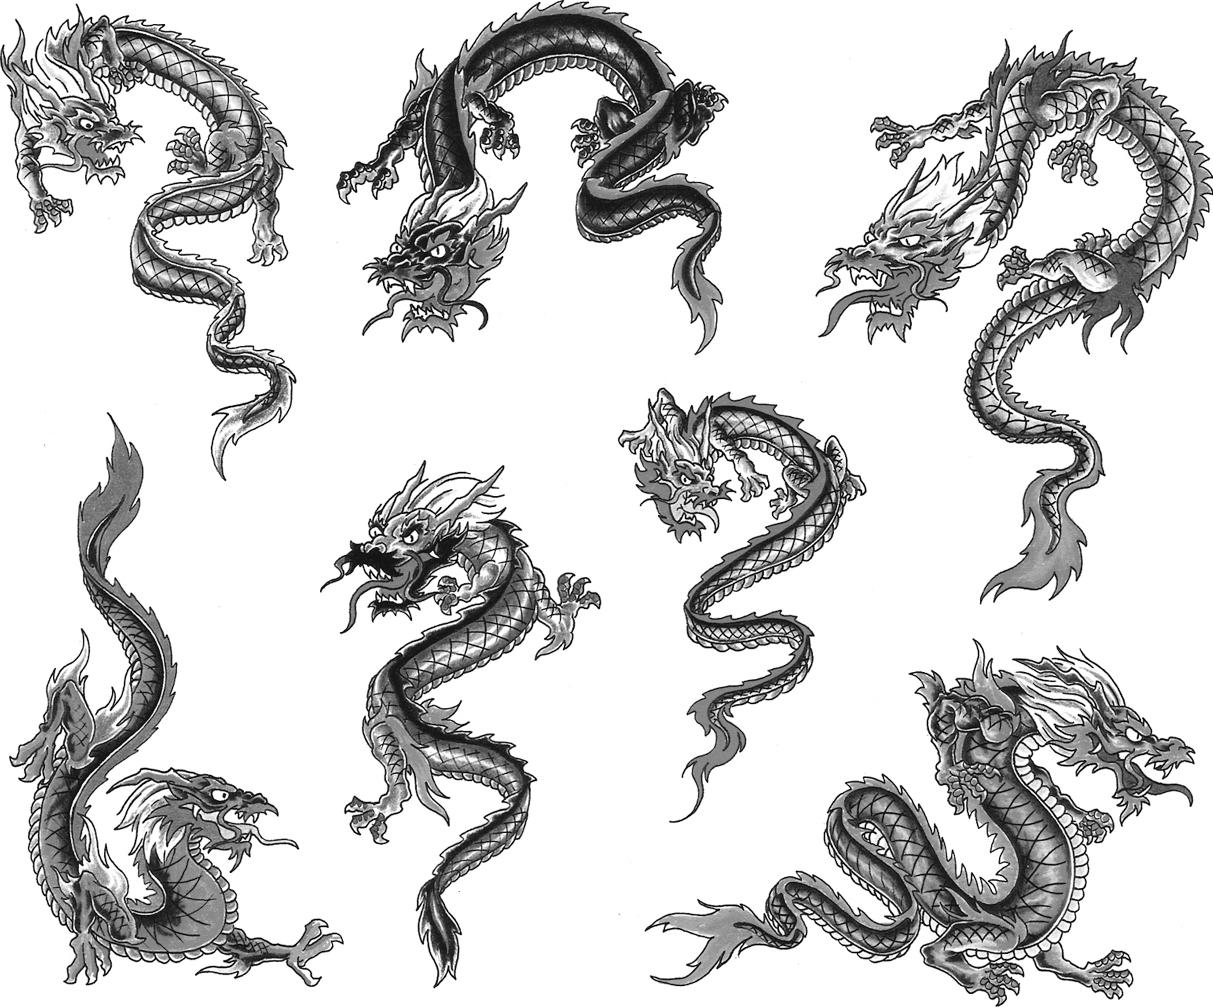 Japanese - Chinese Dragons